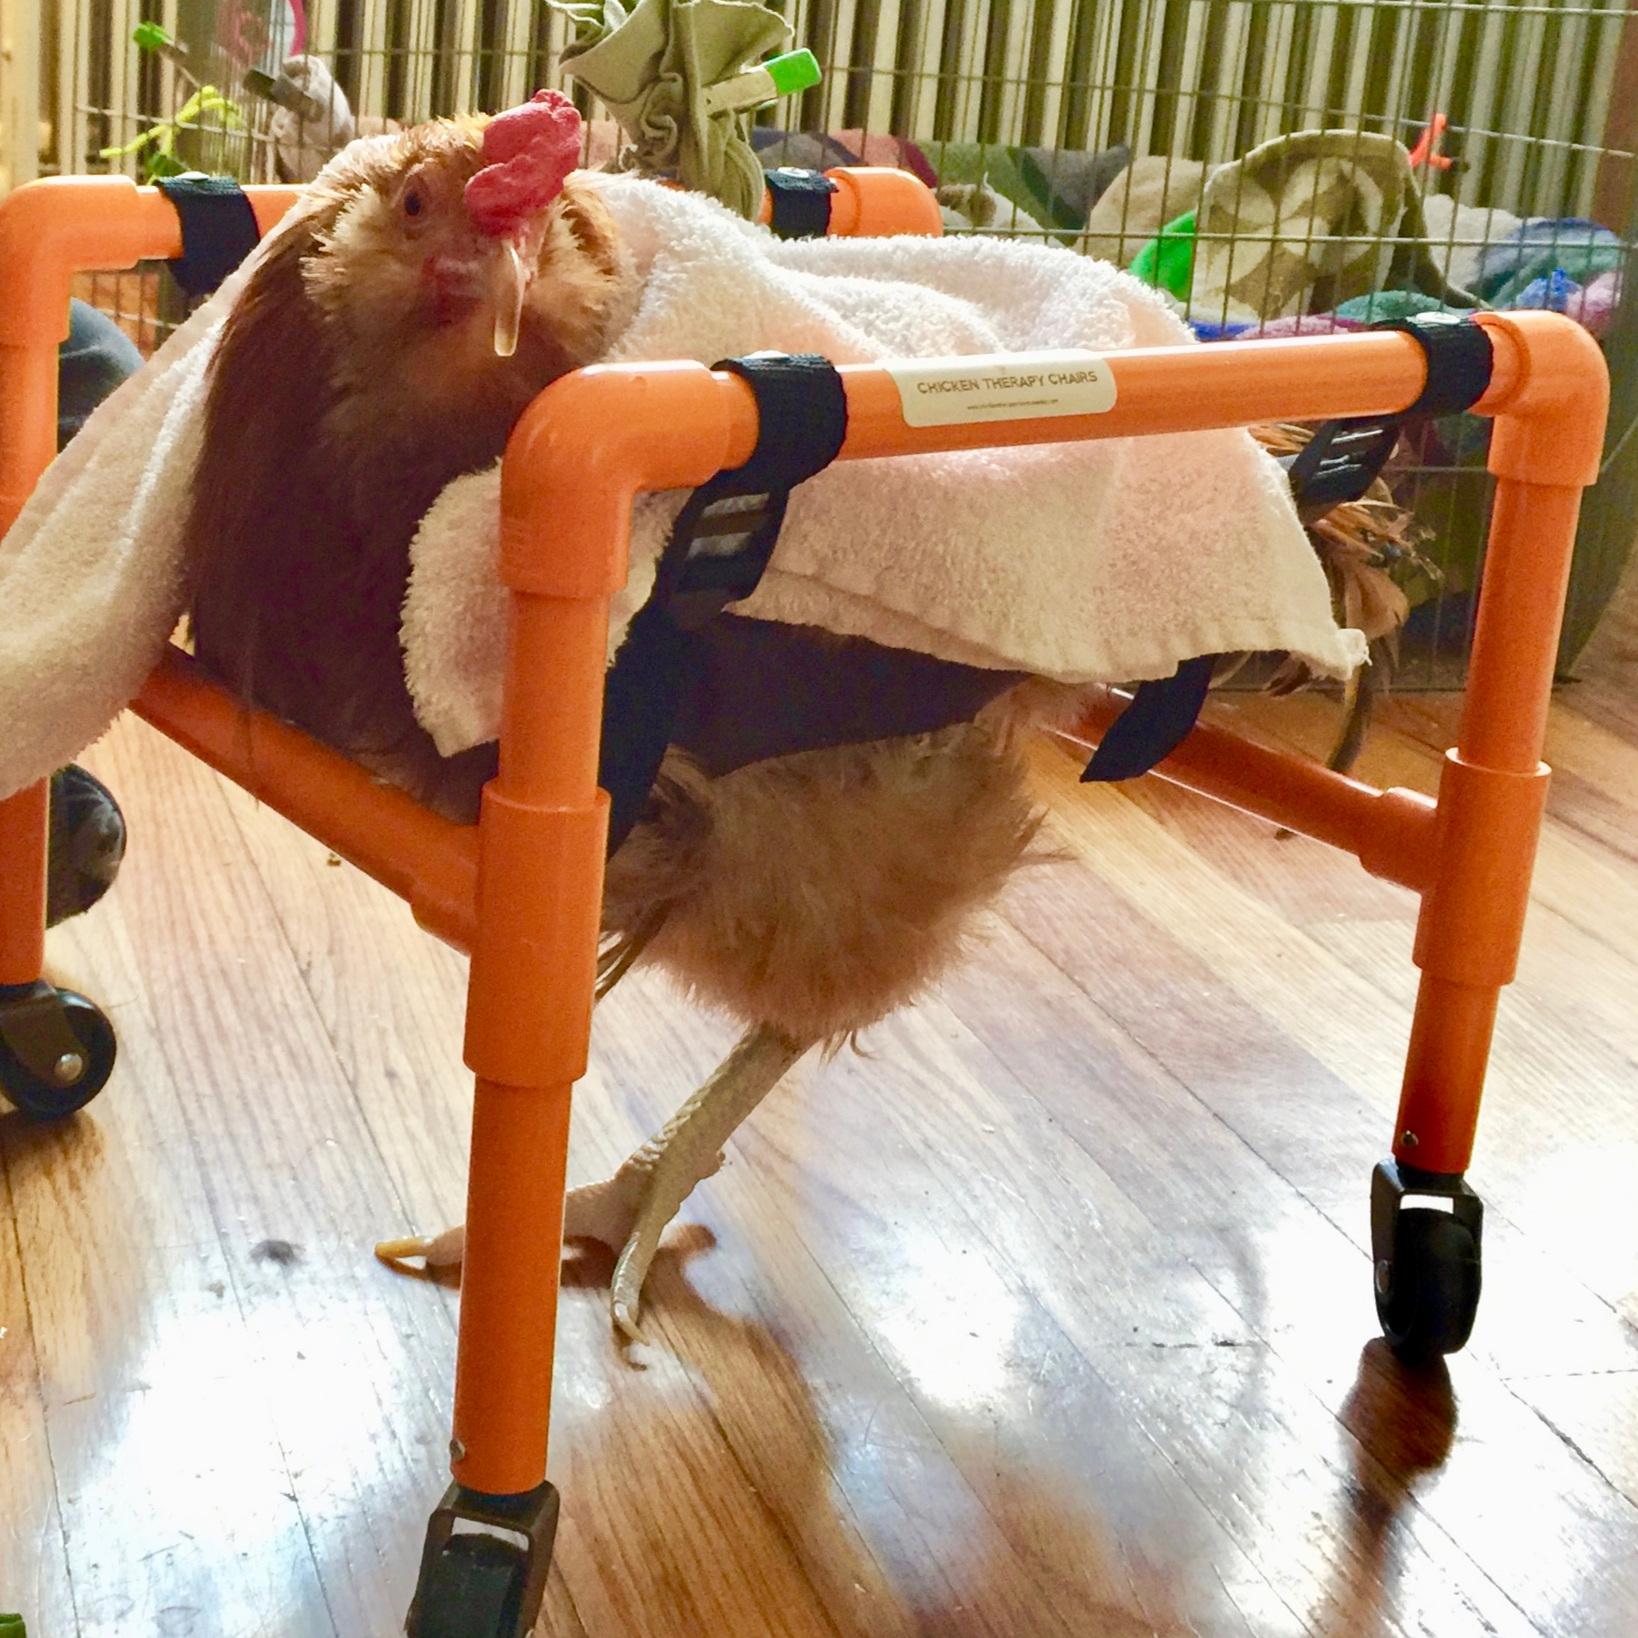 Avery+in+chair+by+Miriam.jpg